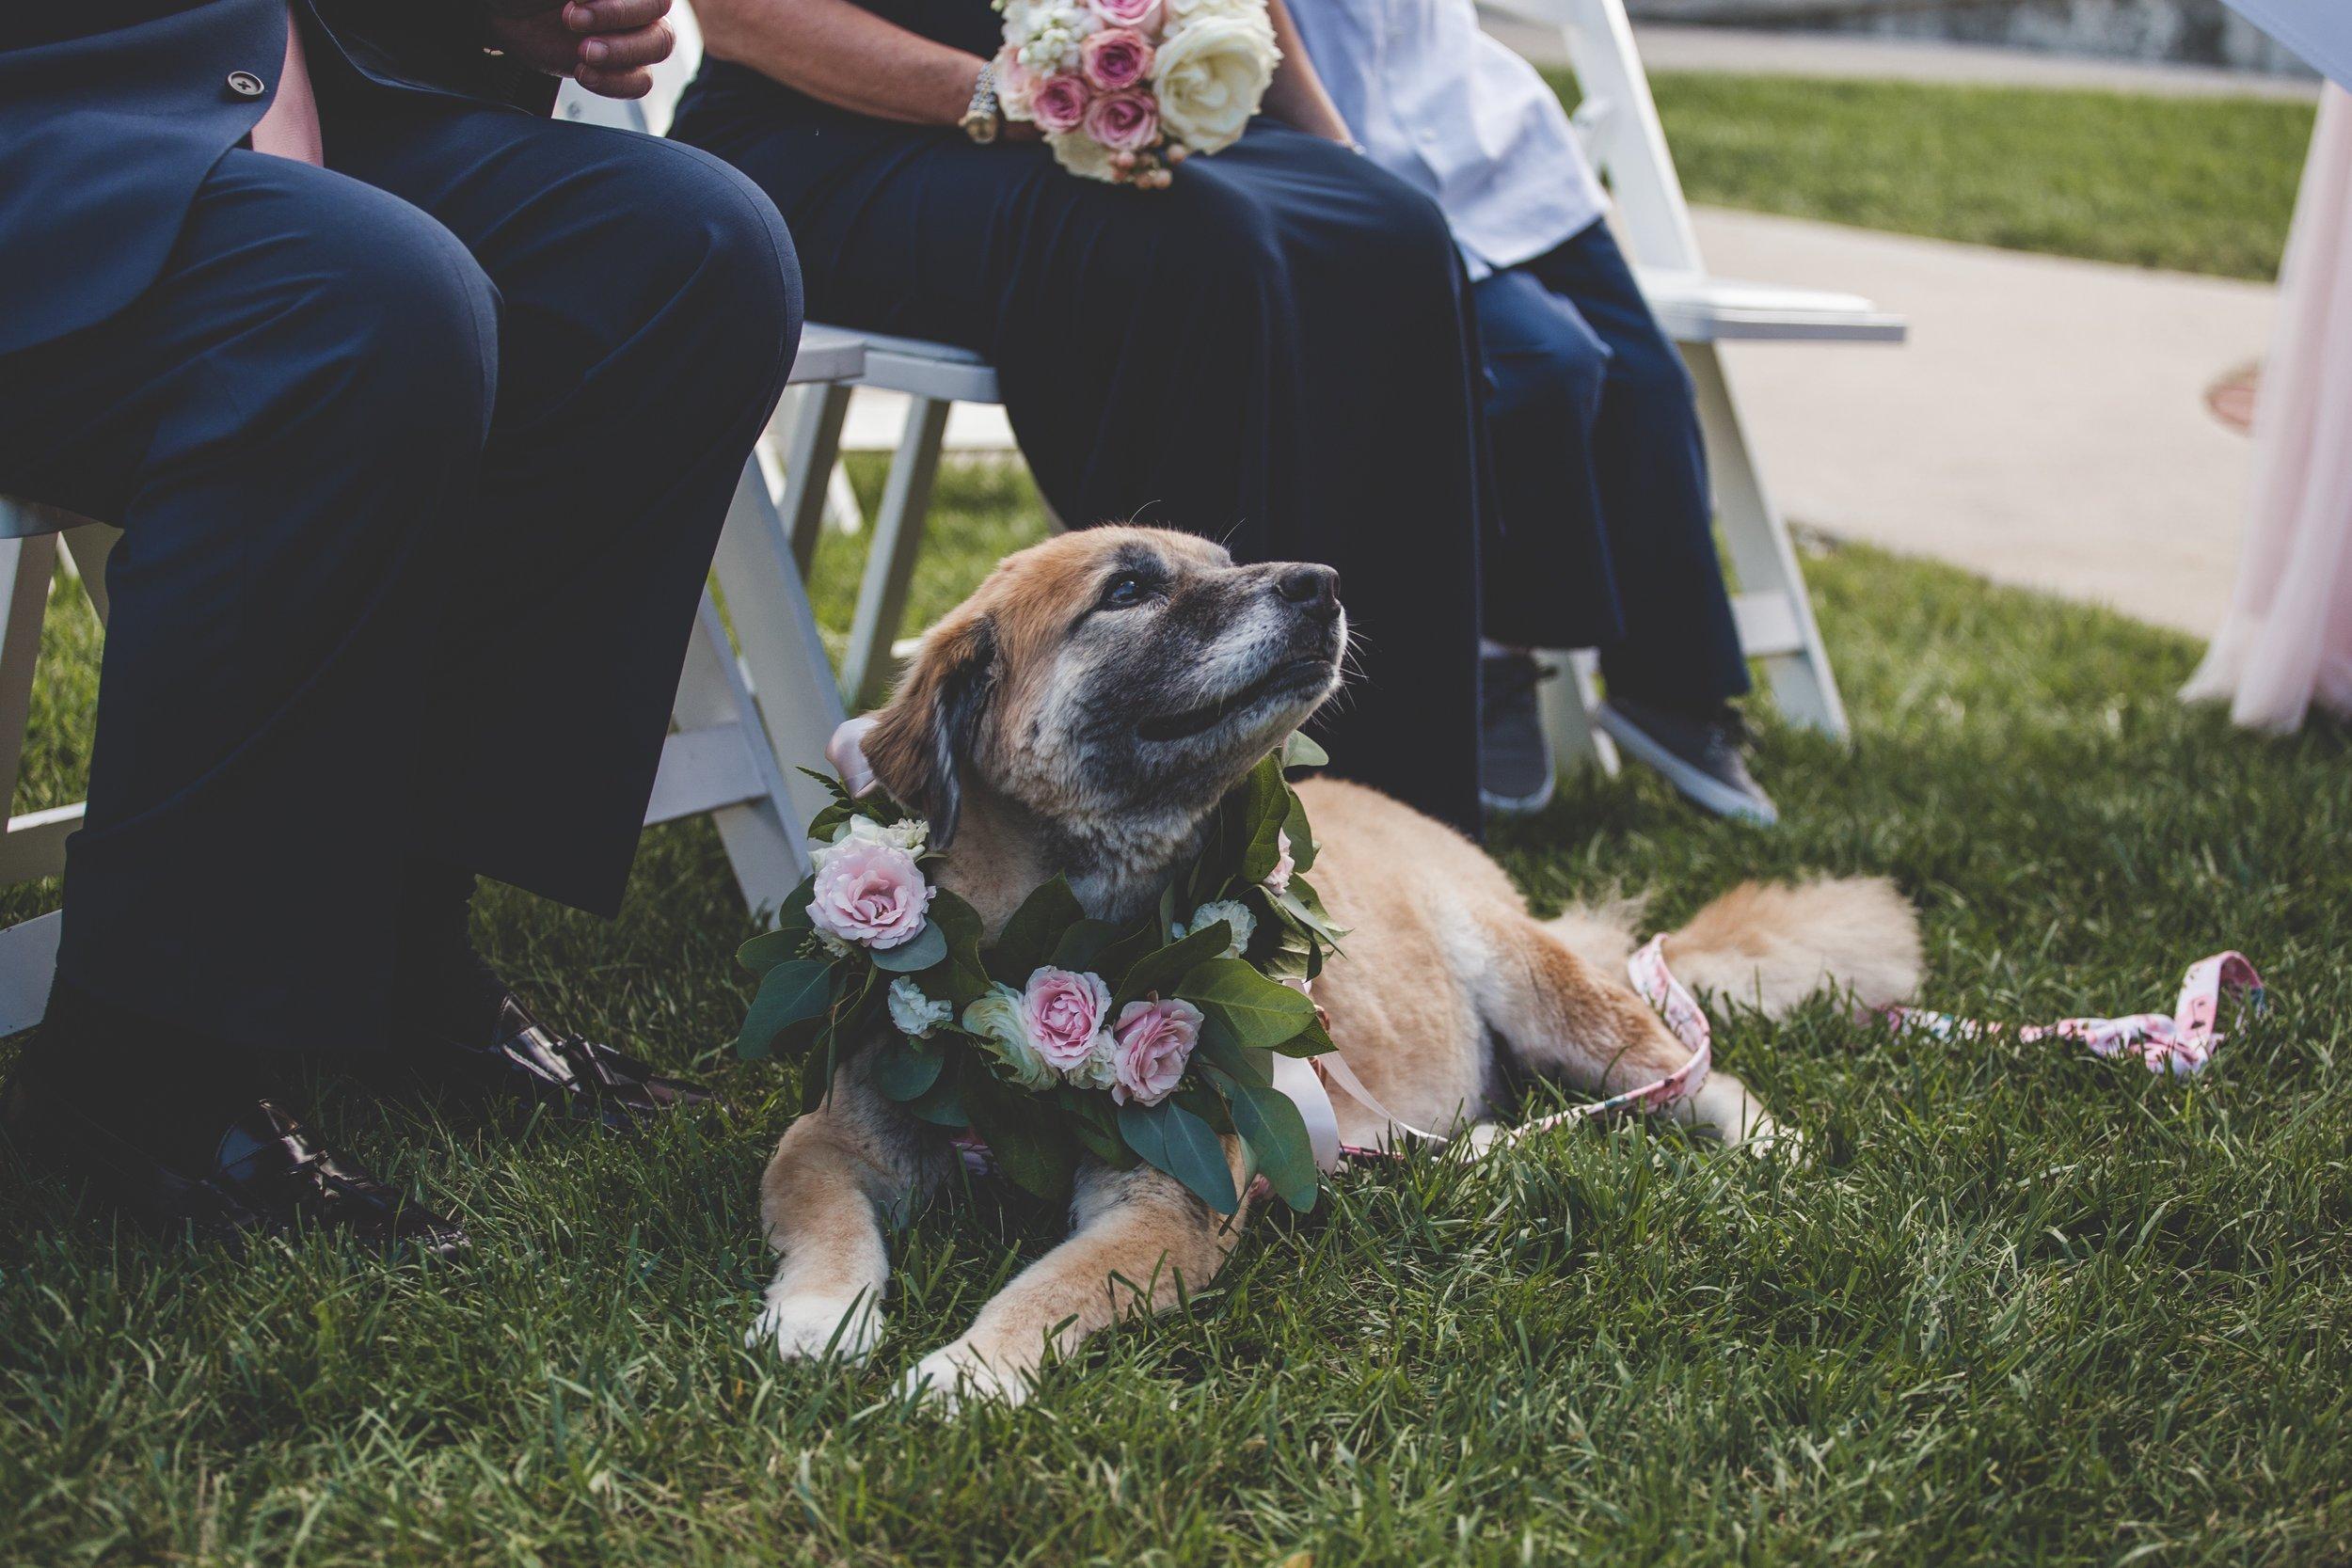 cider-gallery-lawrence-ks-wedding-photographer-jason-domingues-photography-lindsey-paul-0353.jpg